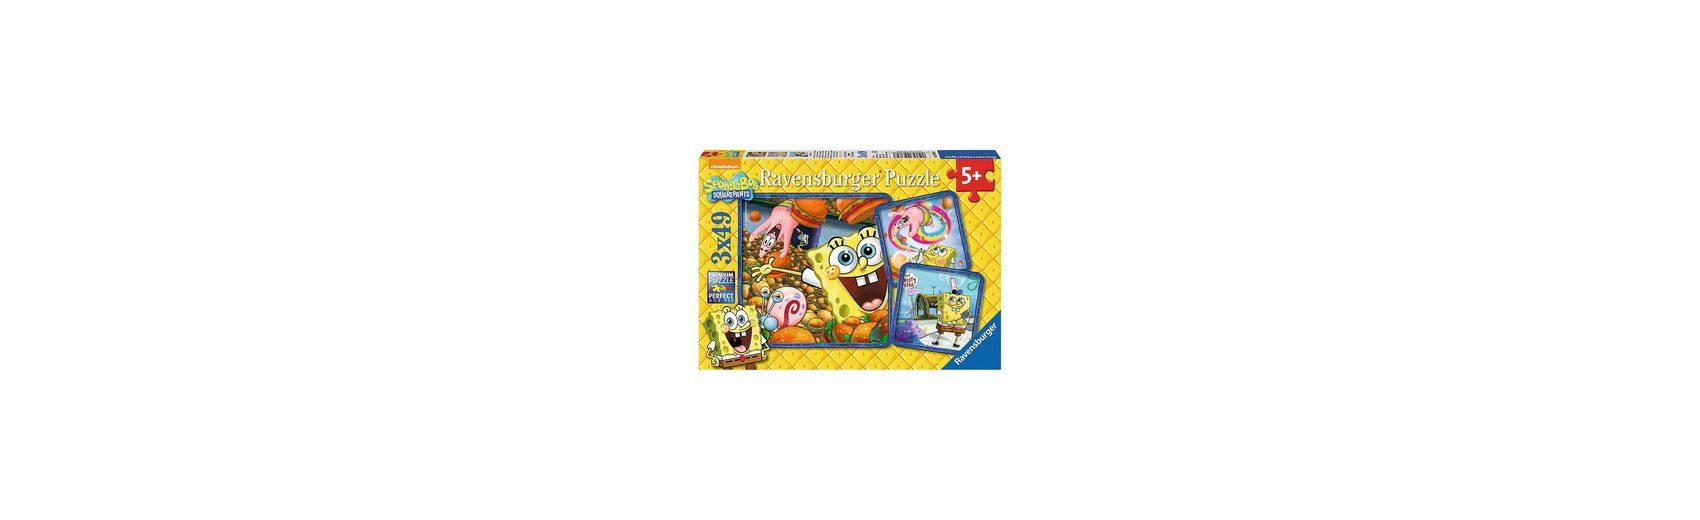 Ravensburger Puzzleset Spaß mit Spongebob 3 x 49 Teile